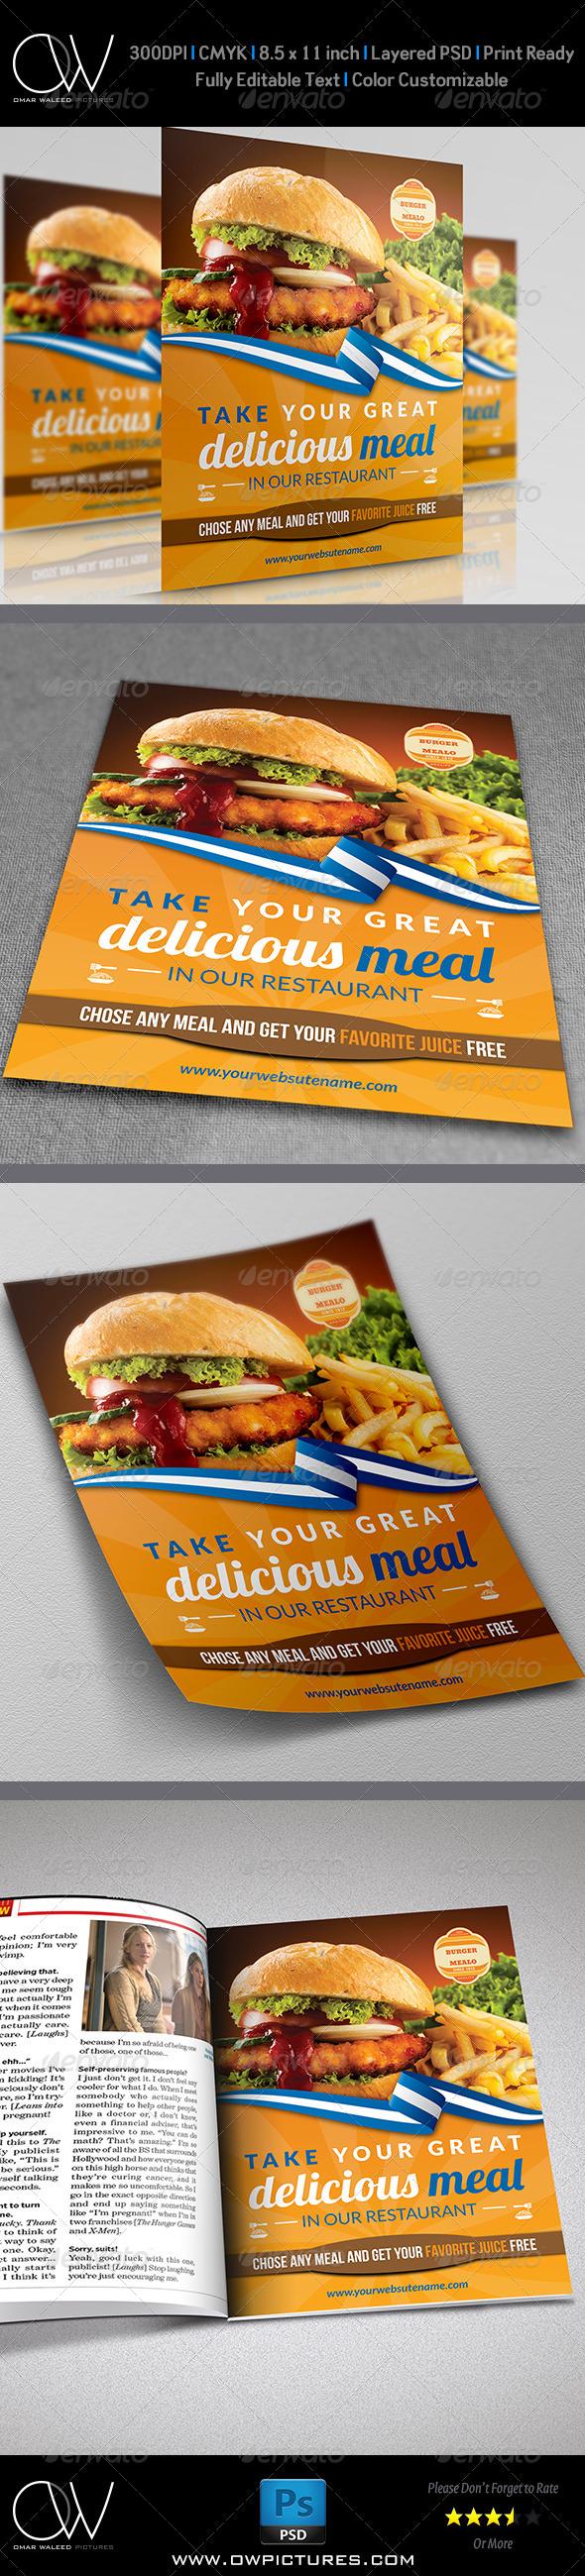 Burger Restaurant Flyer Template   Restaurante y Hamburguesas